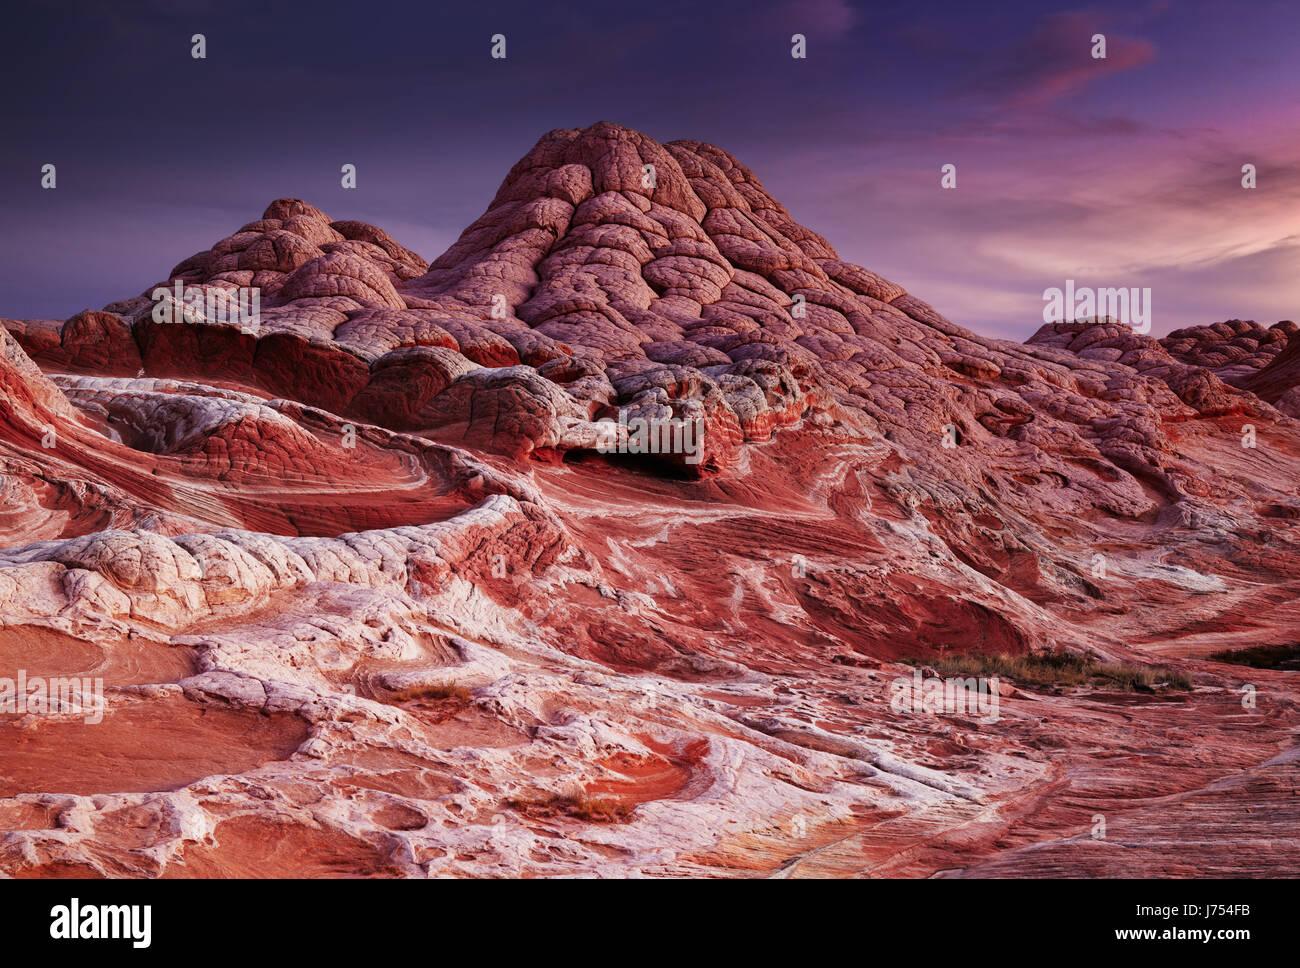 White Pocket rock formations, Vermilion Cliffs National Monument, Arizona, USA Photo Stock